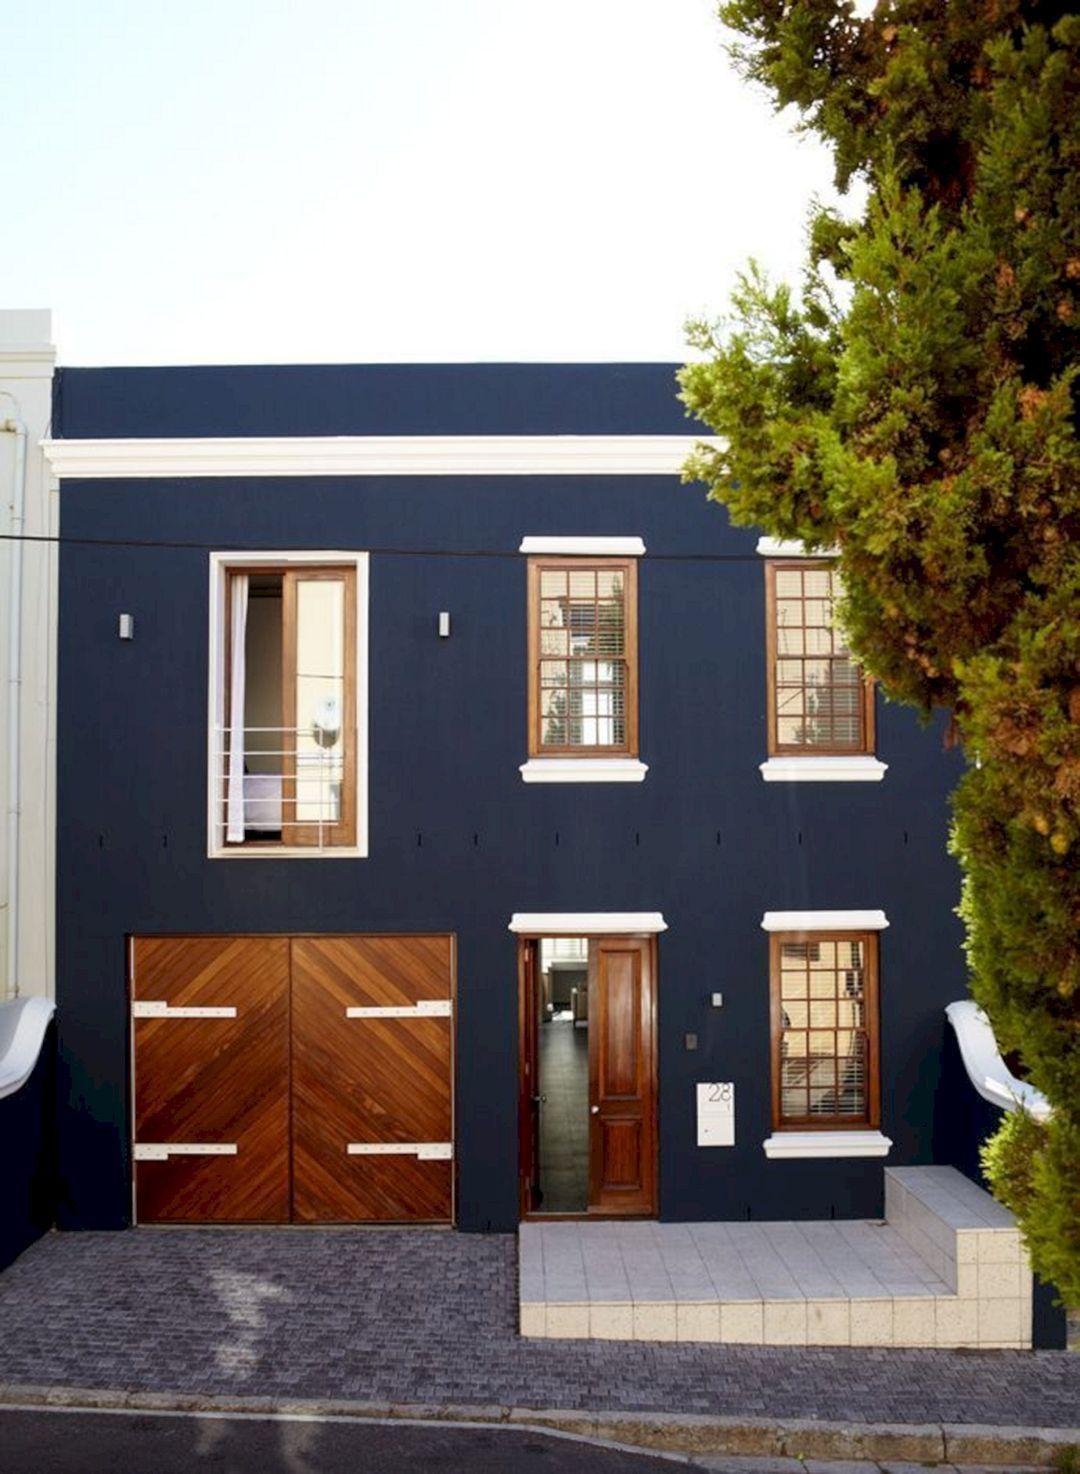 Dark Blue Exterior House Color Door (Dark Blue Exterior House Color Door) design ideas and photos #exteriorhousecolors